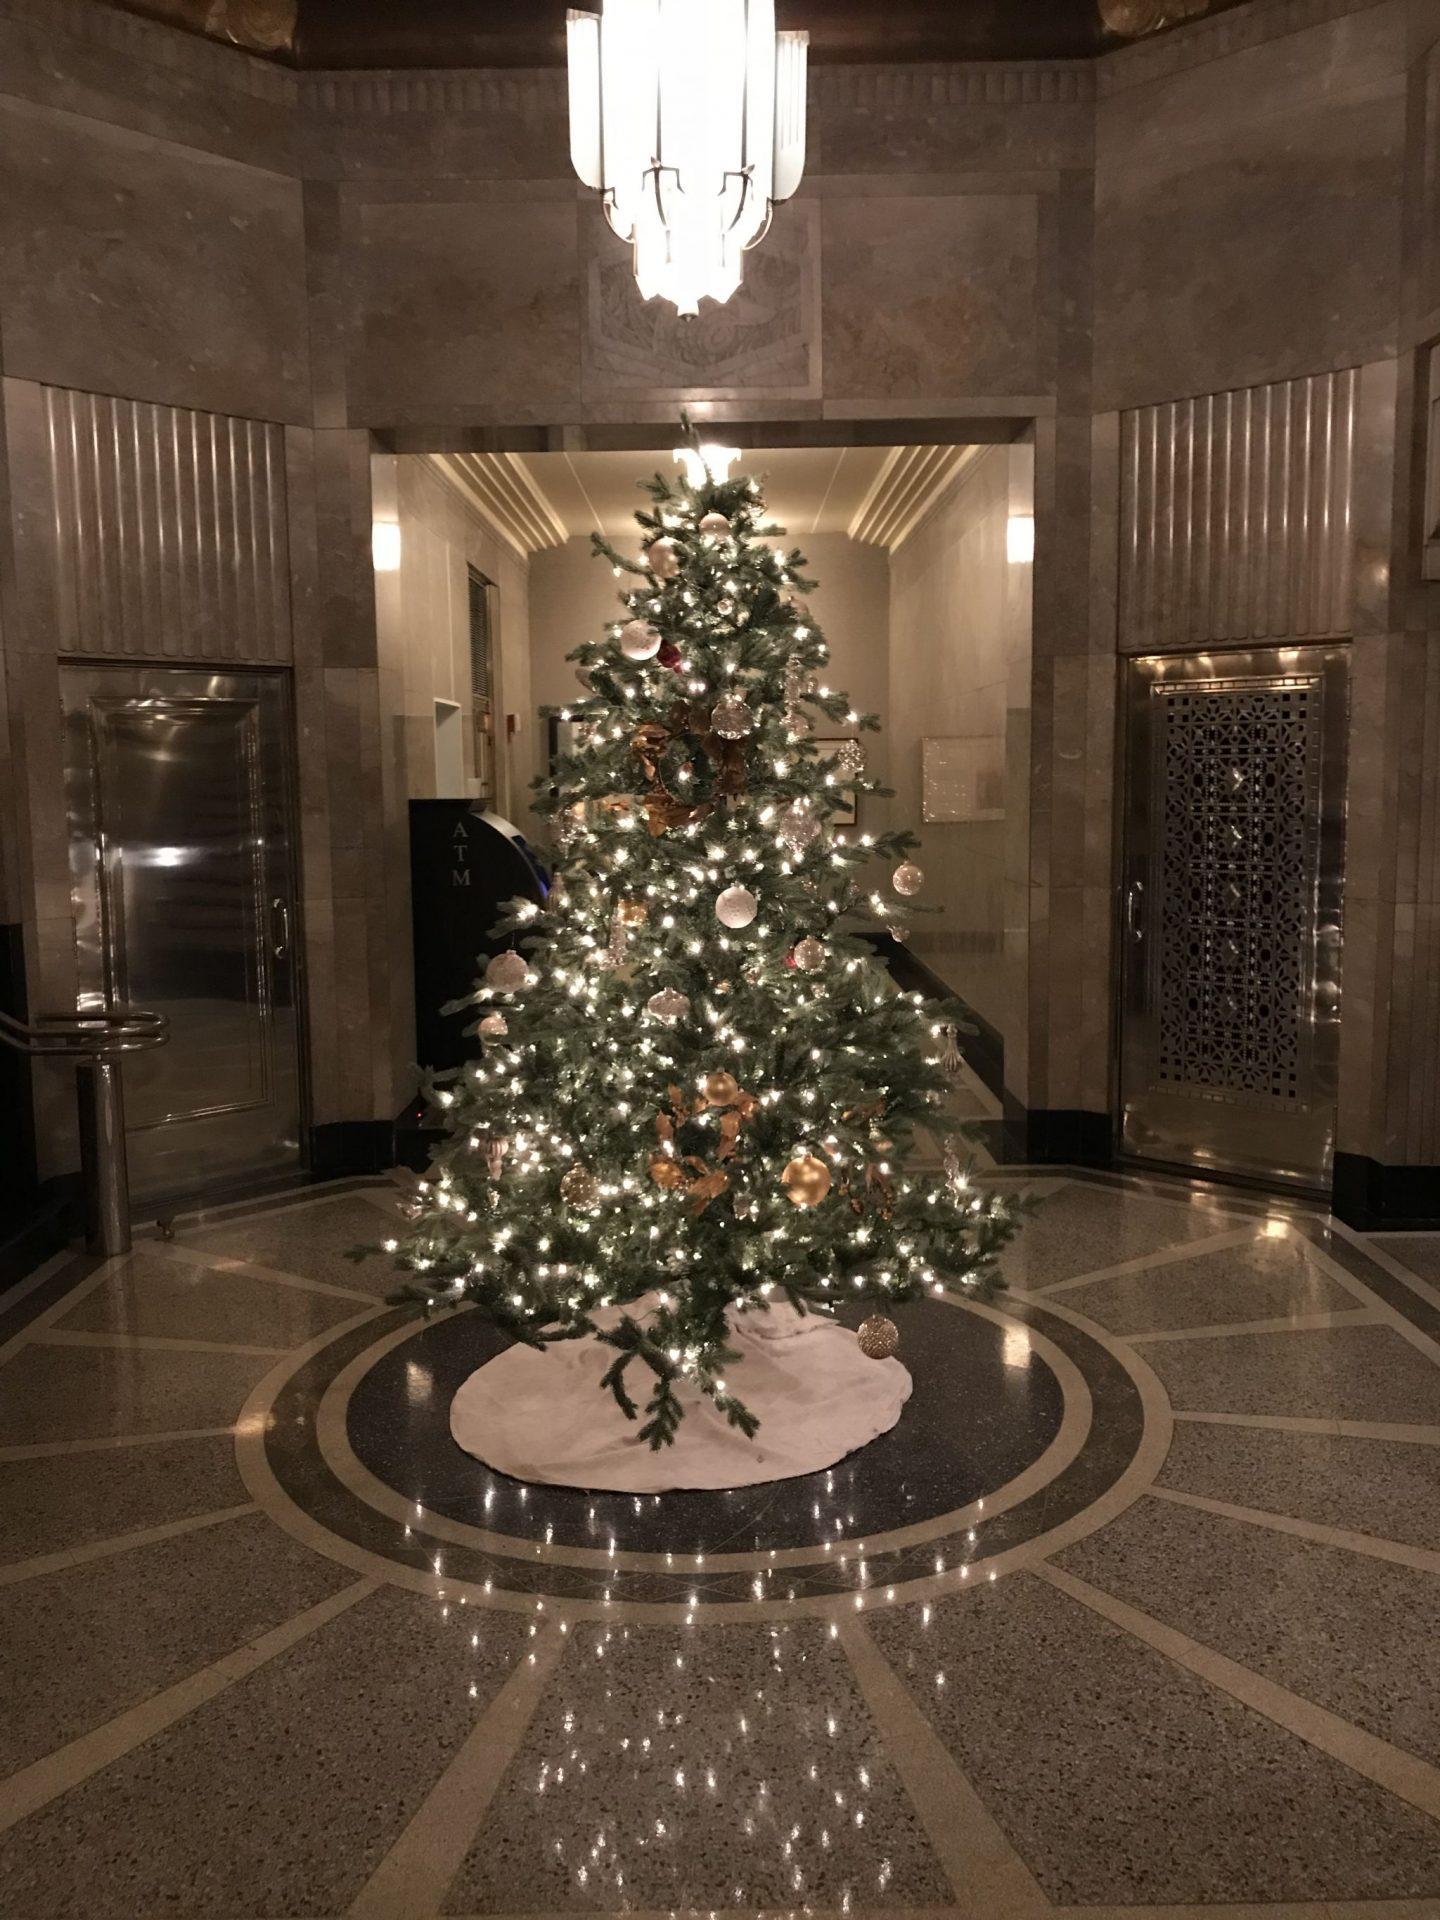 Kimpton Cardinal Hotel - Christmas - Lauren Schwaiger Travel Blog